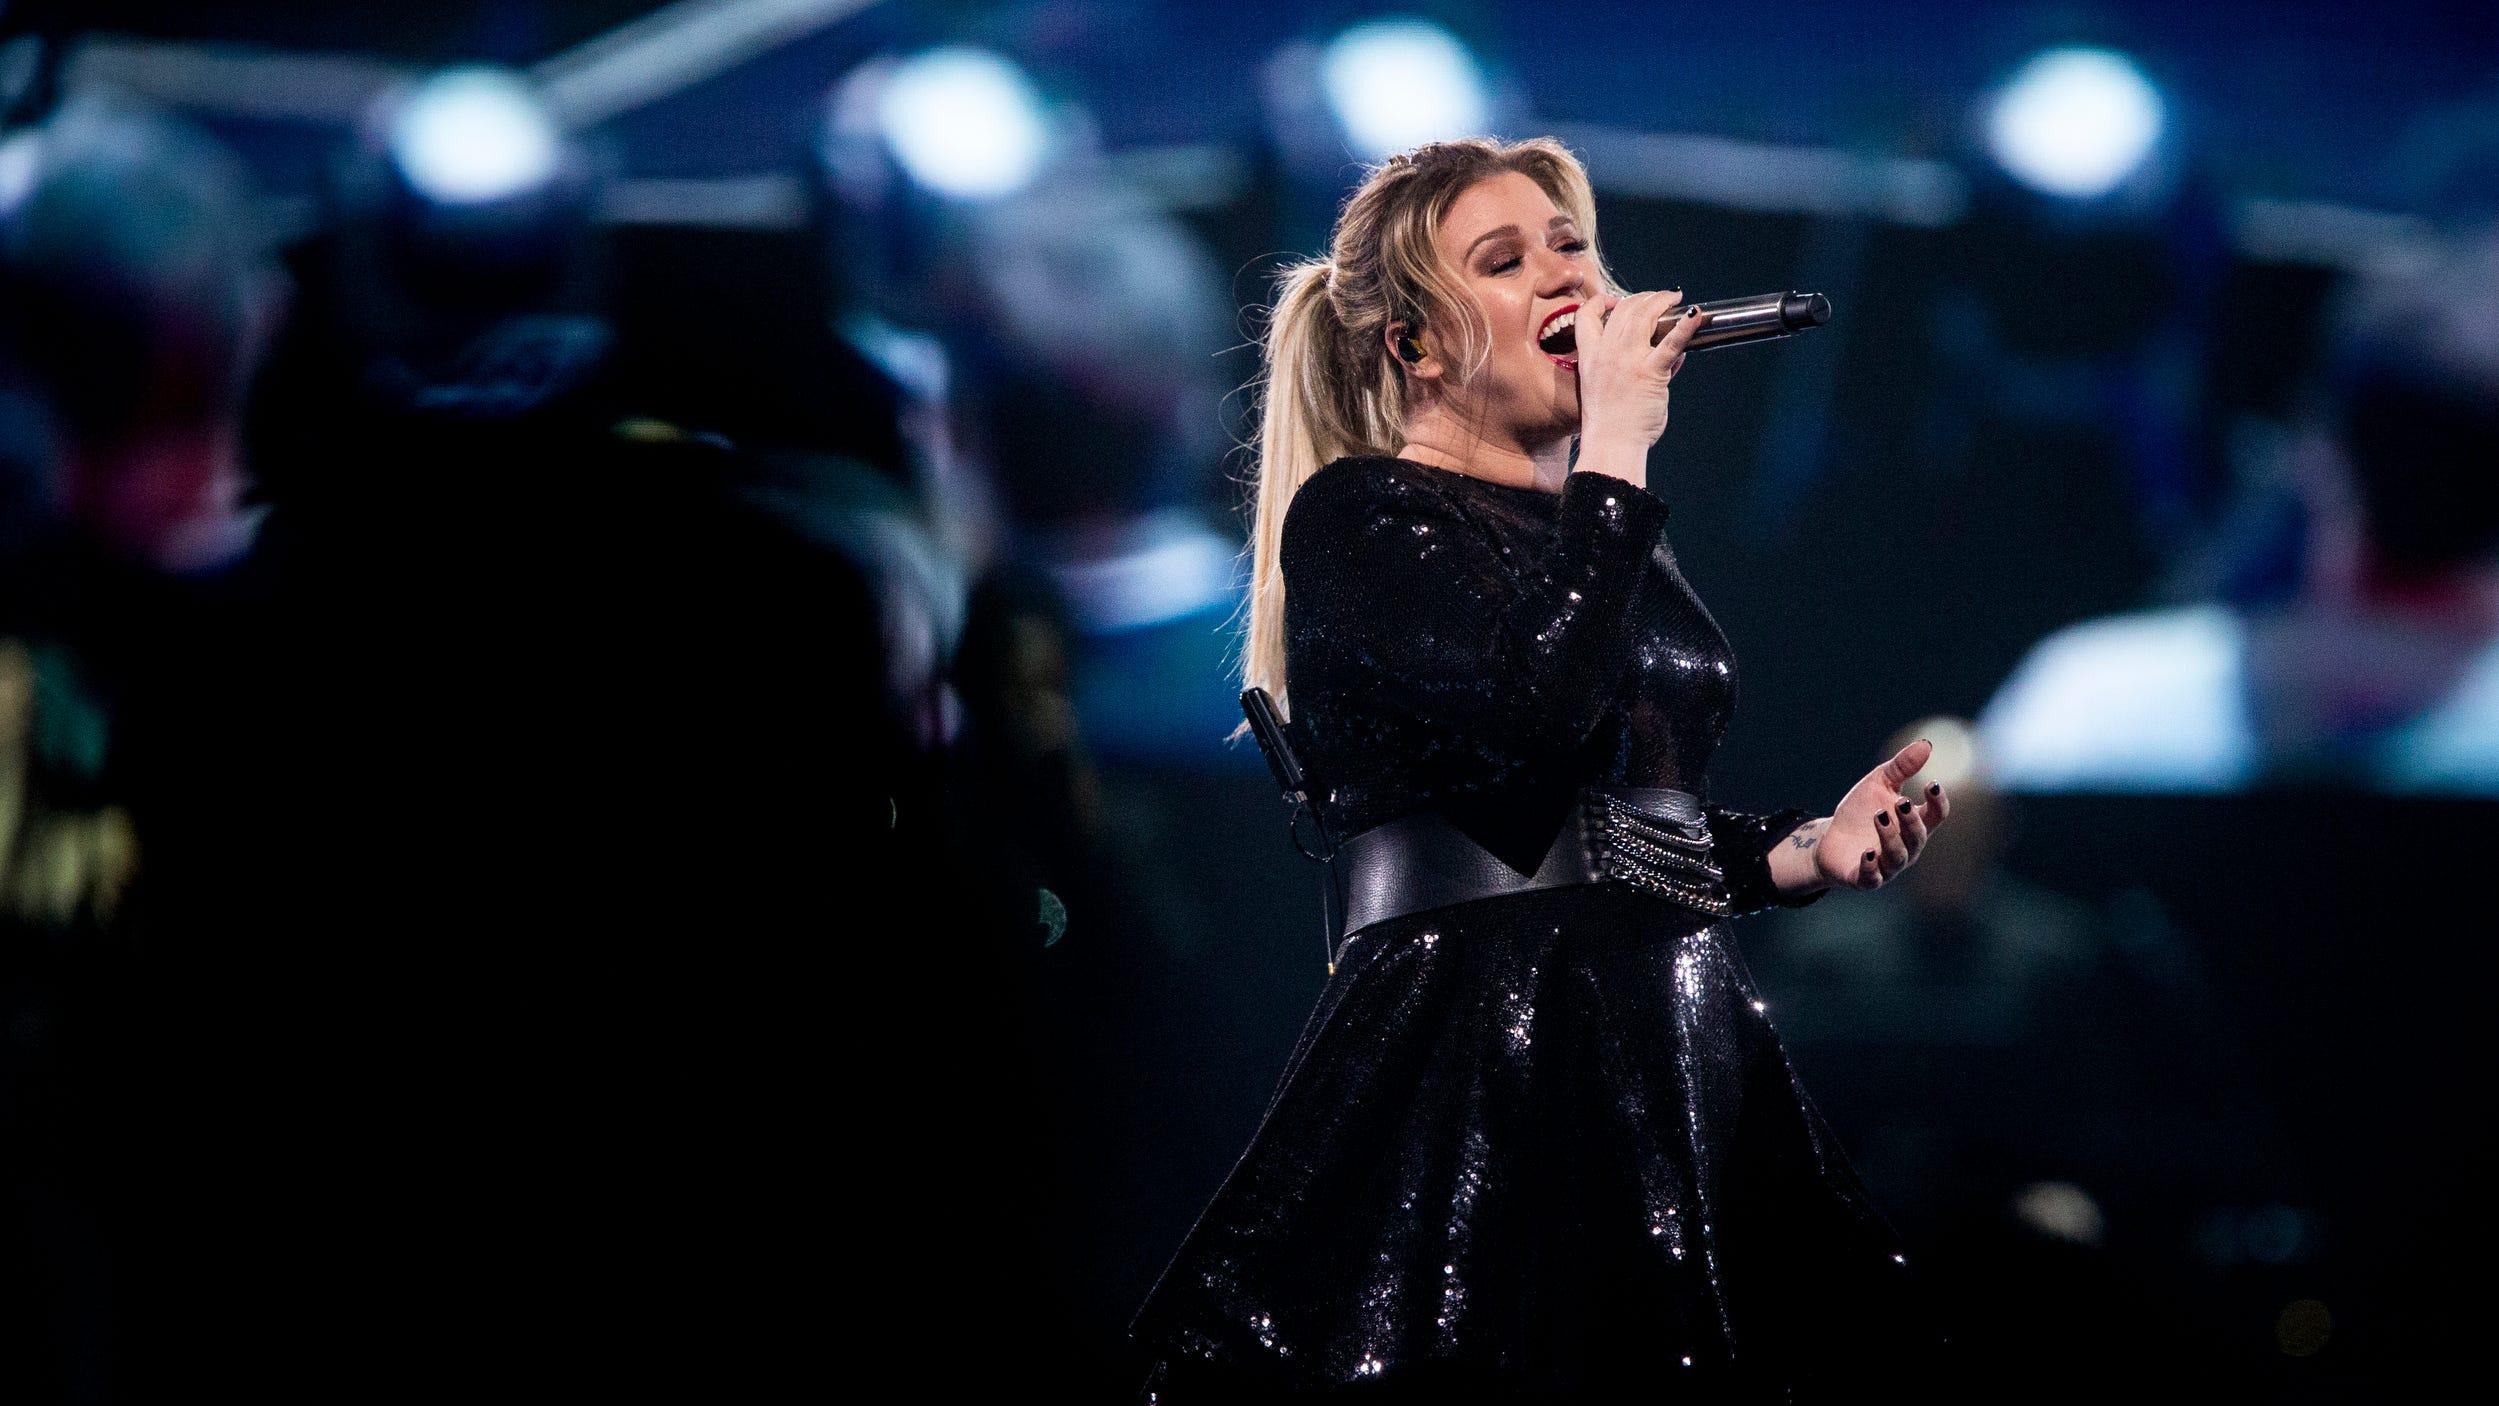 GALLERY: Kelly Clarkson, Kelsea Ballerini & The Voice's Brynn Cartelli perform at US Bank